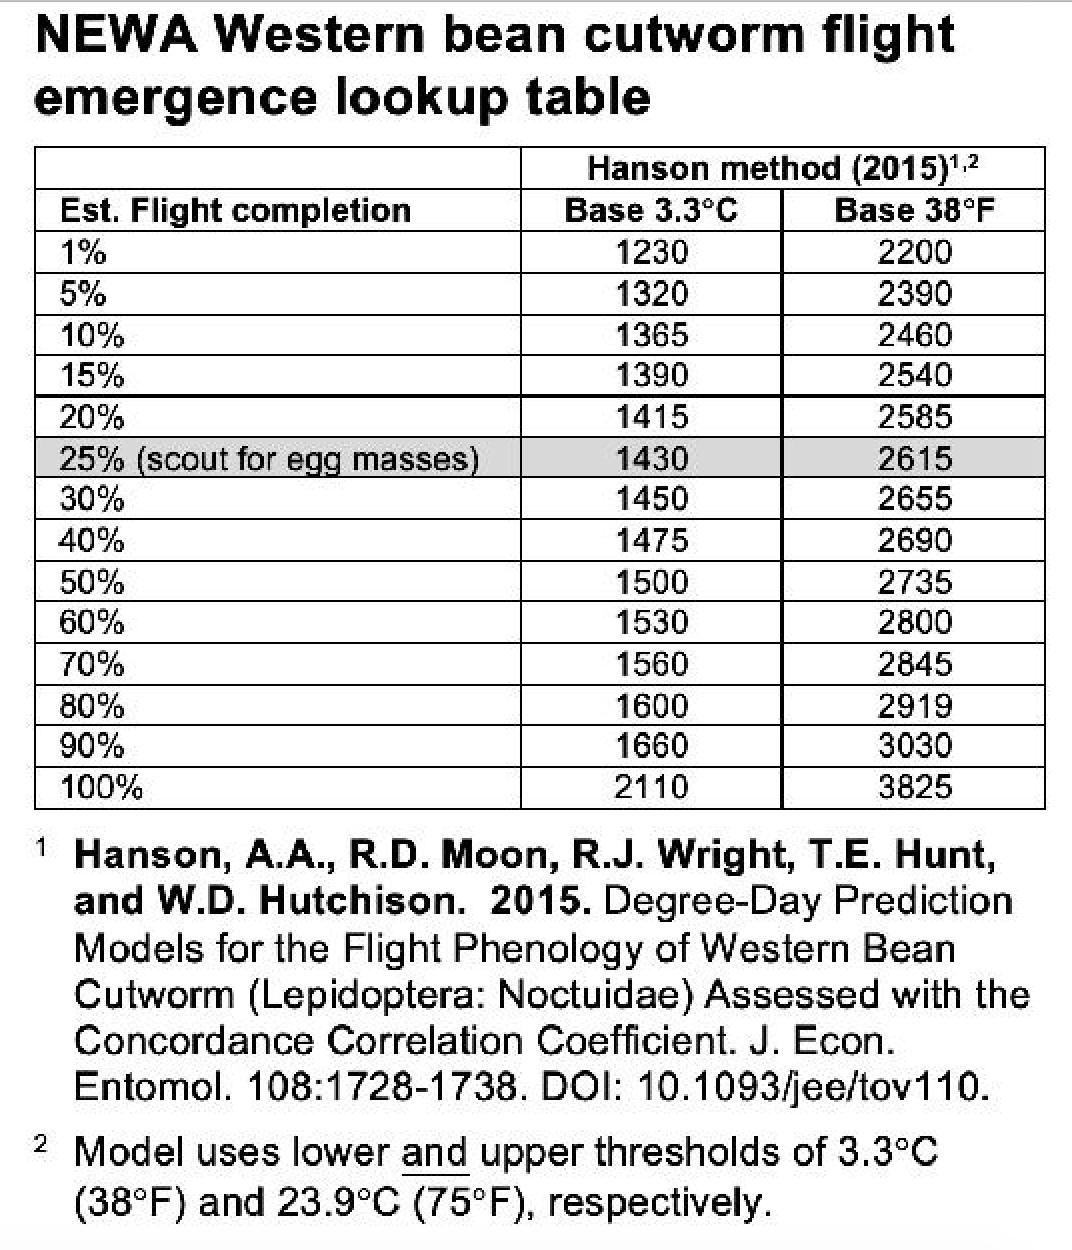 WBC flight emergence table